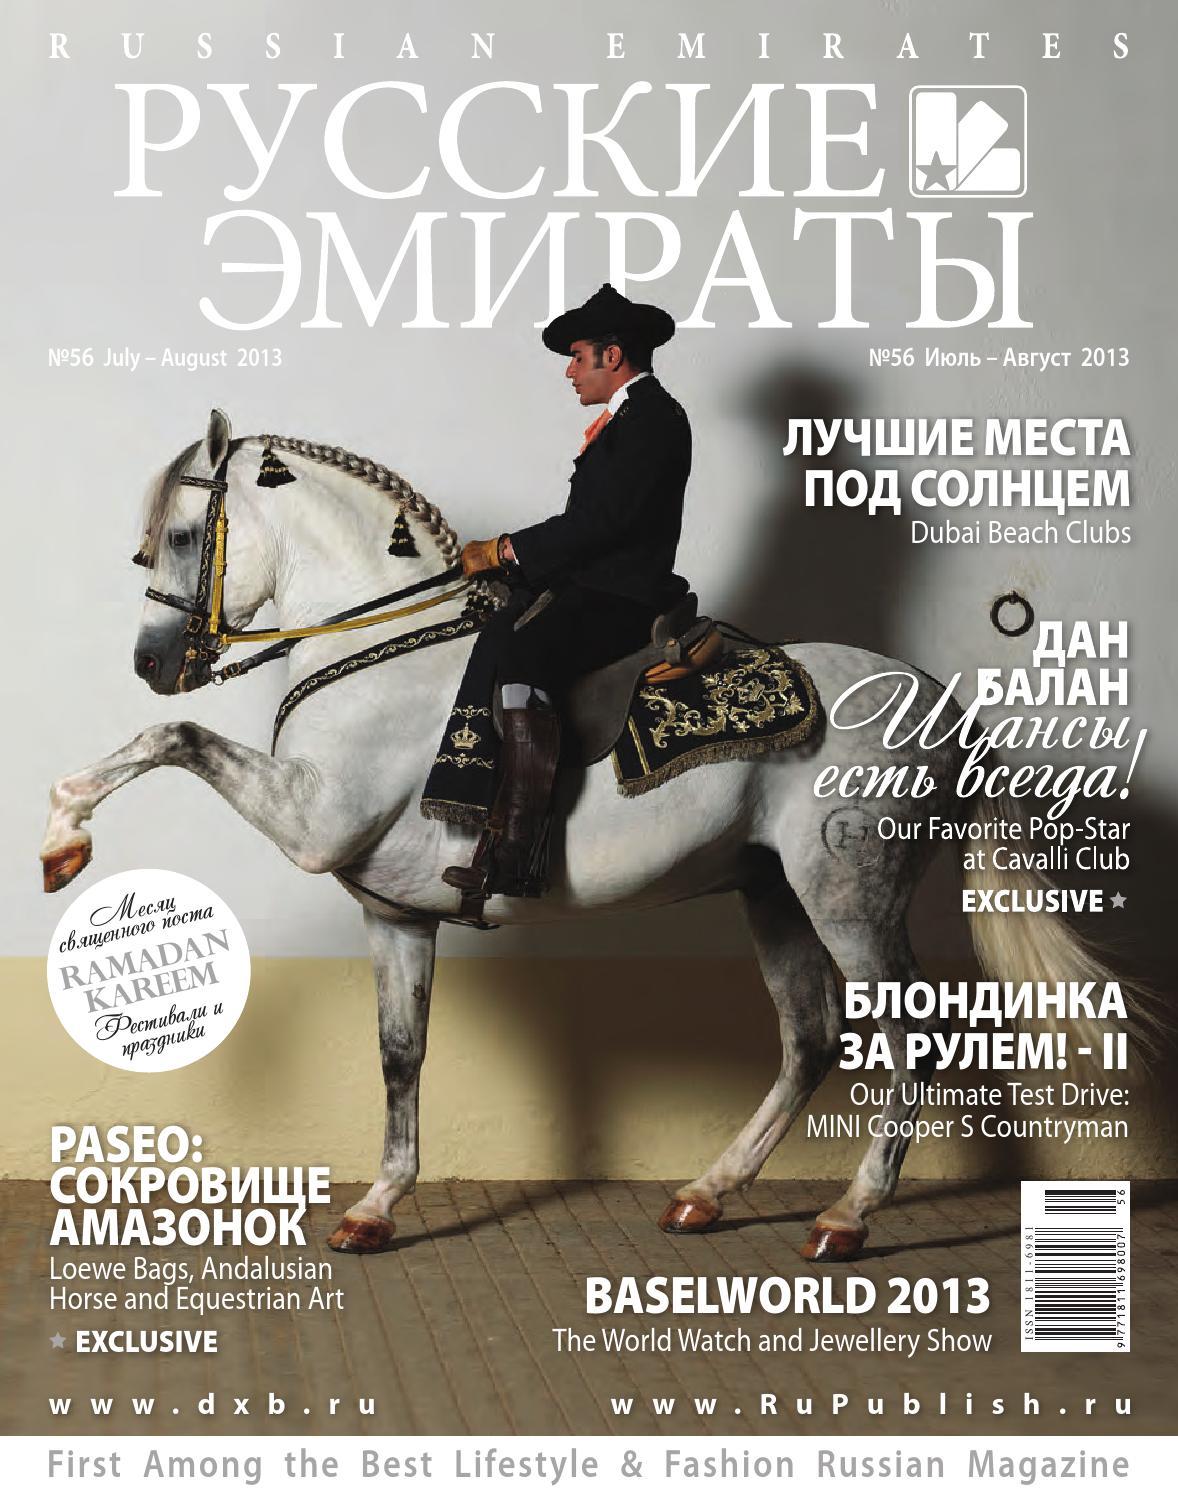 Russian Emirates Magazine     56   Jul - Aug 2013 by Russian Emirates -  issuu 9197e487942